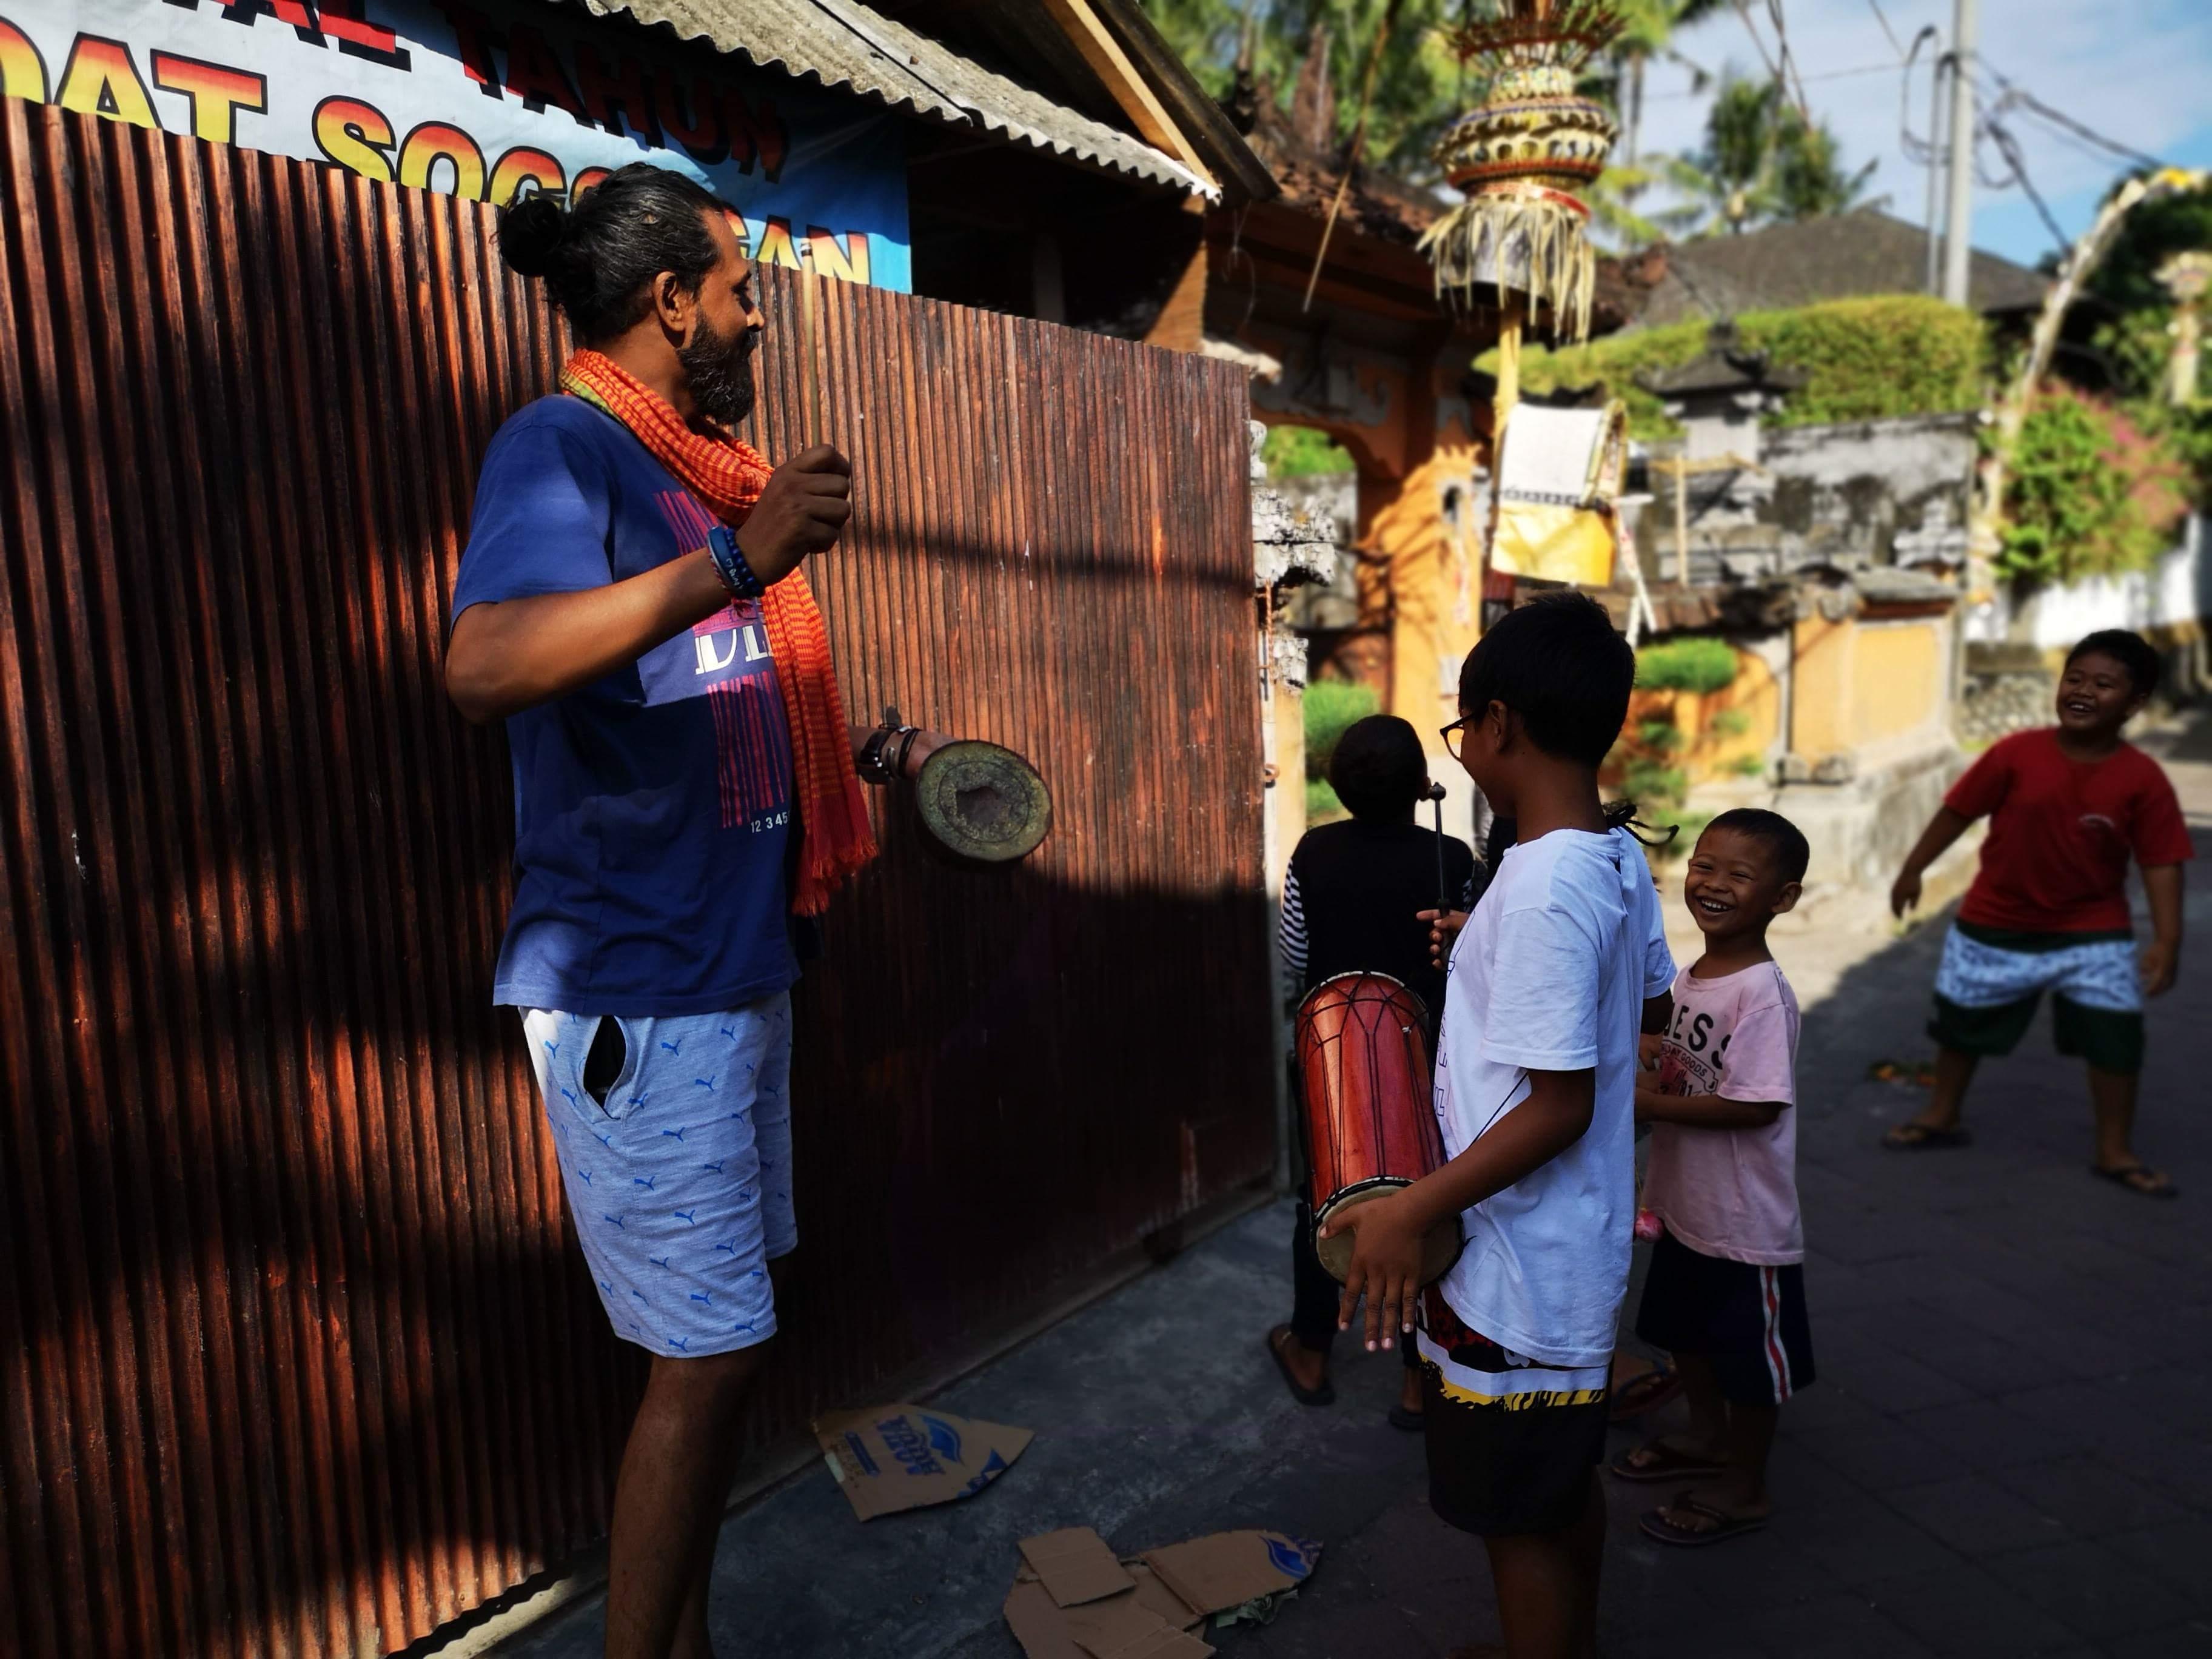 Kids Playing in Bali